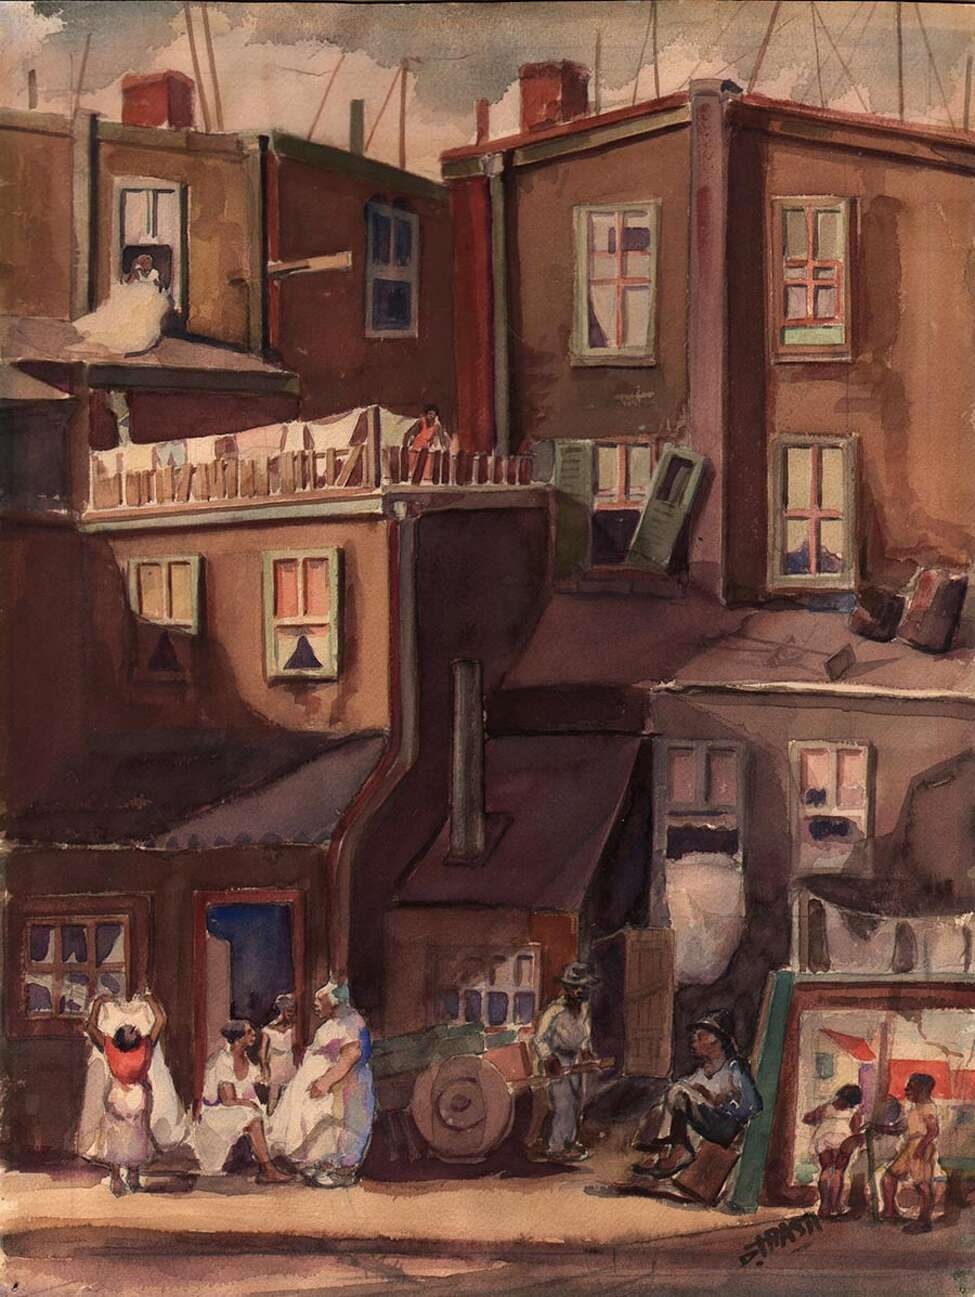 Dox Thrash, City Plevins, ca. 1939. Watercolor. Courtesy of DolanMaxwell